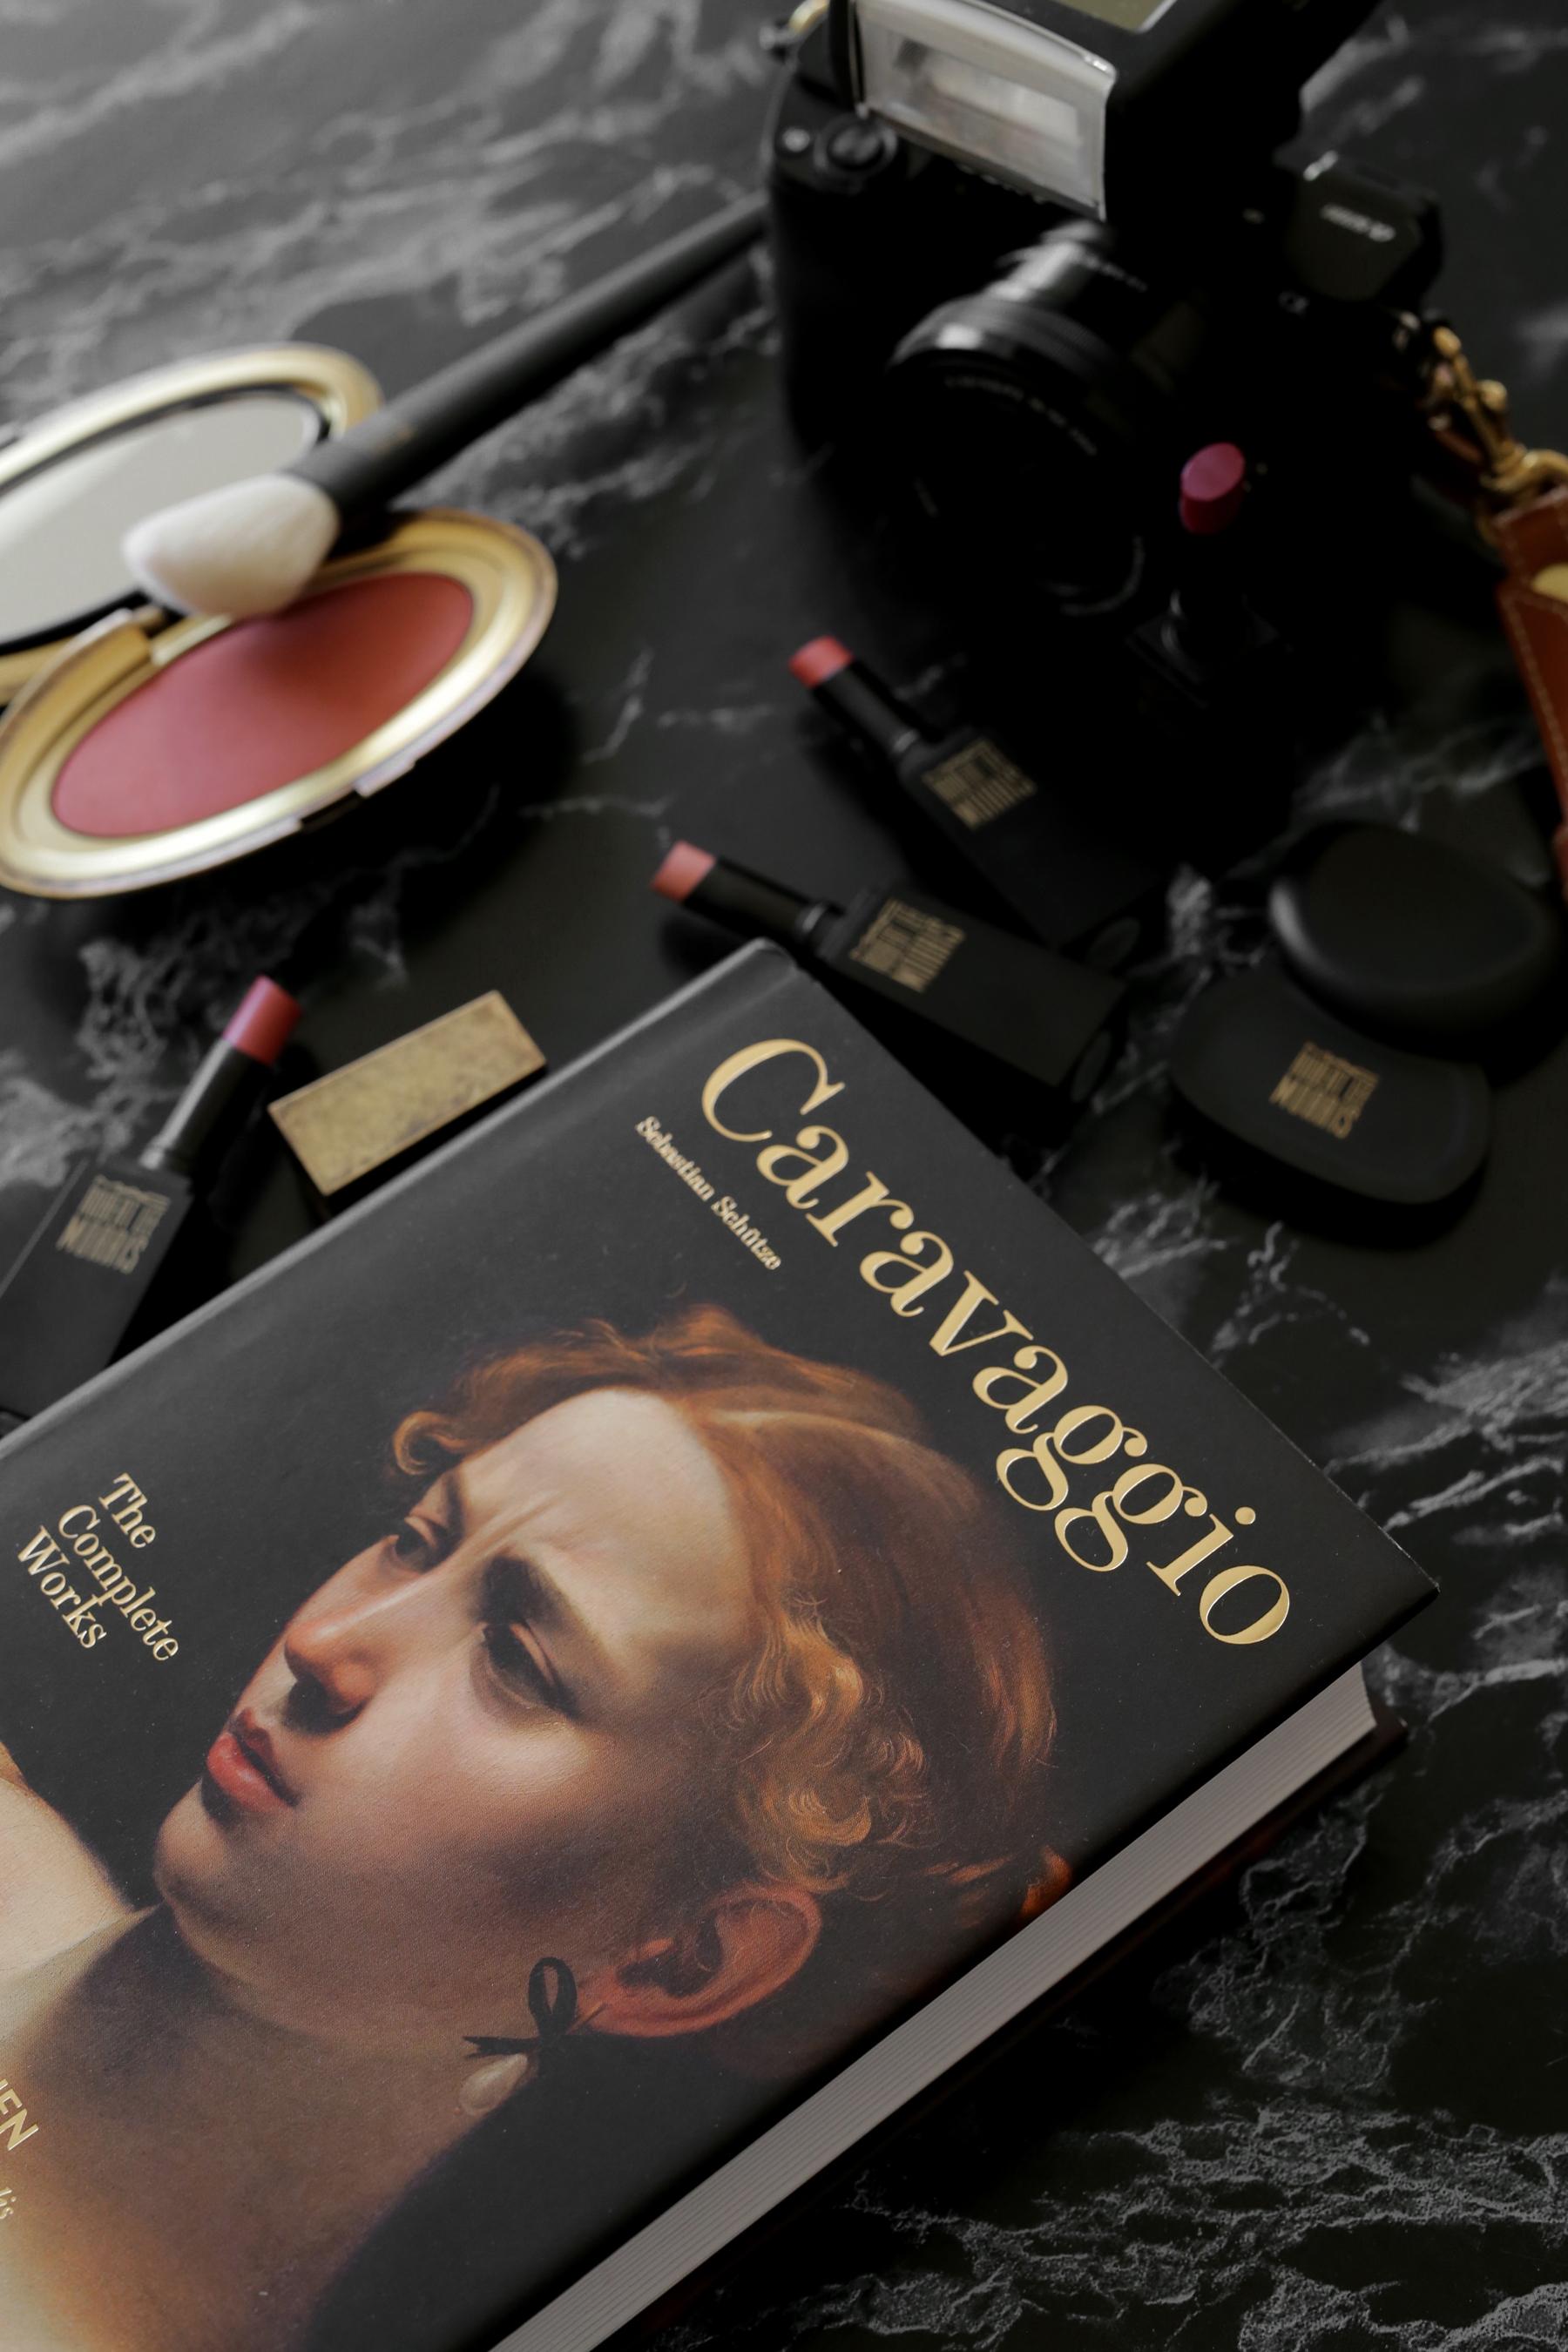 MAC x Robert Lee Morris makeup collection 2017 lipstick, blush, powder, compact, brush, beauty_5569.jpg